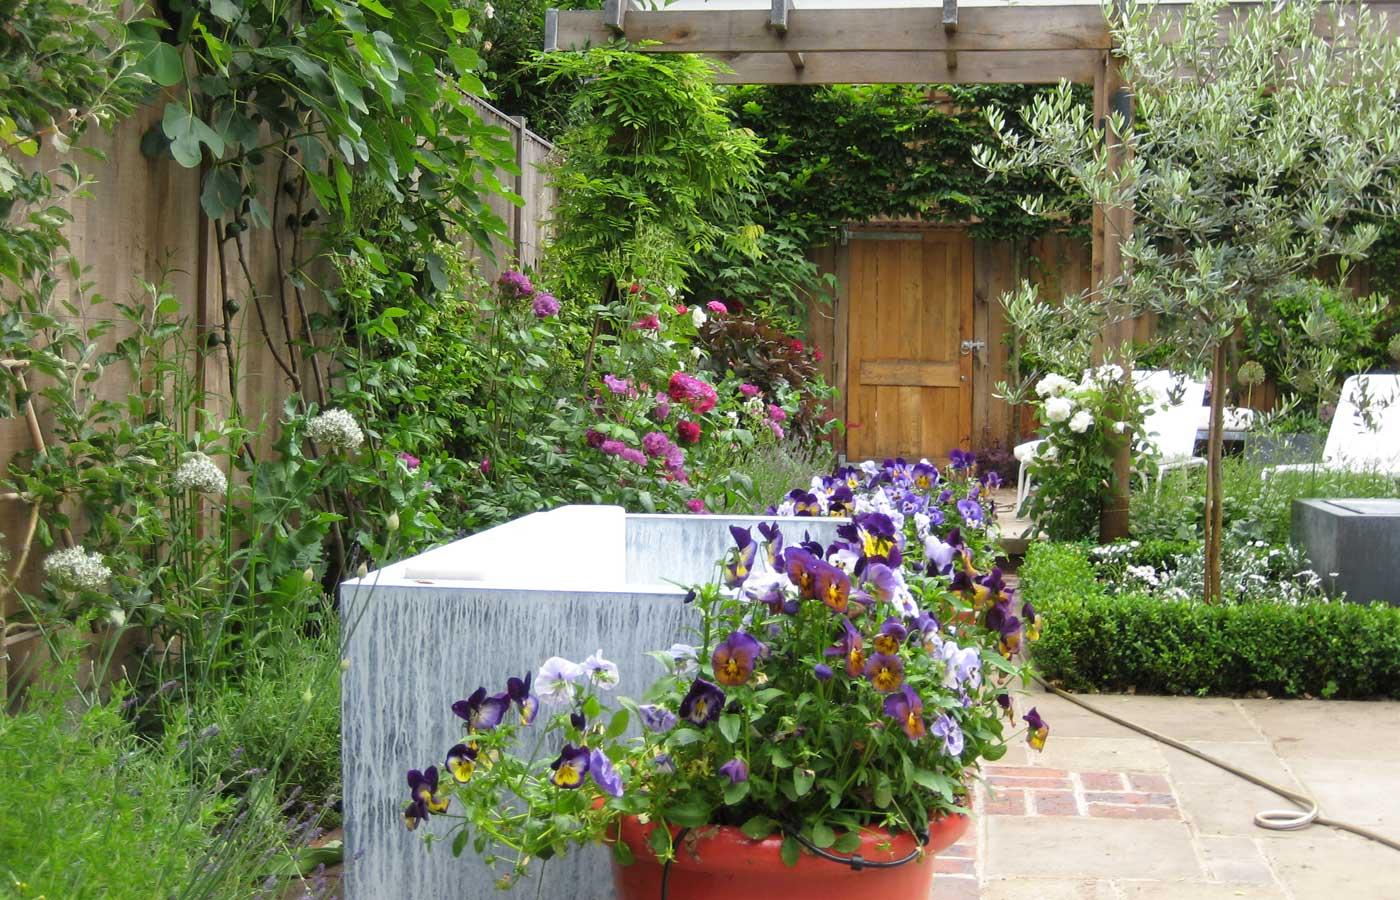 ... Lead Trough And Pot Plants In A Kew Garden ...